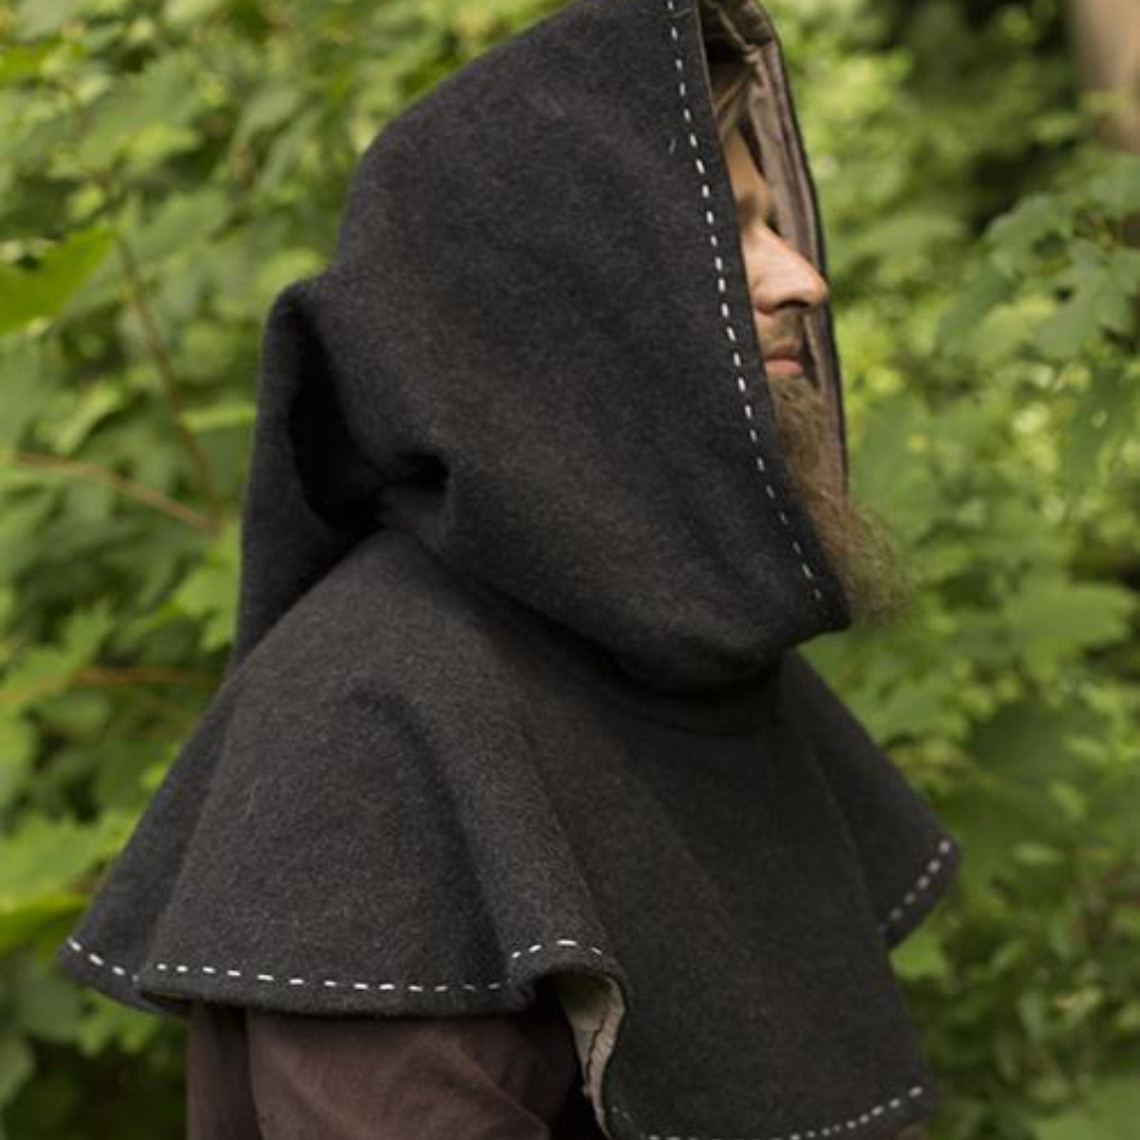 Epic Armoury Carabina medieval Erhard, gris oscuro.